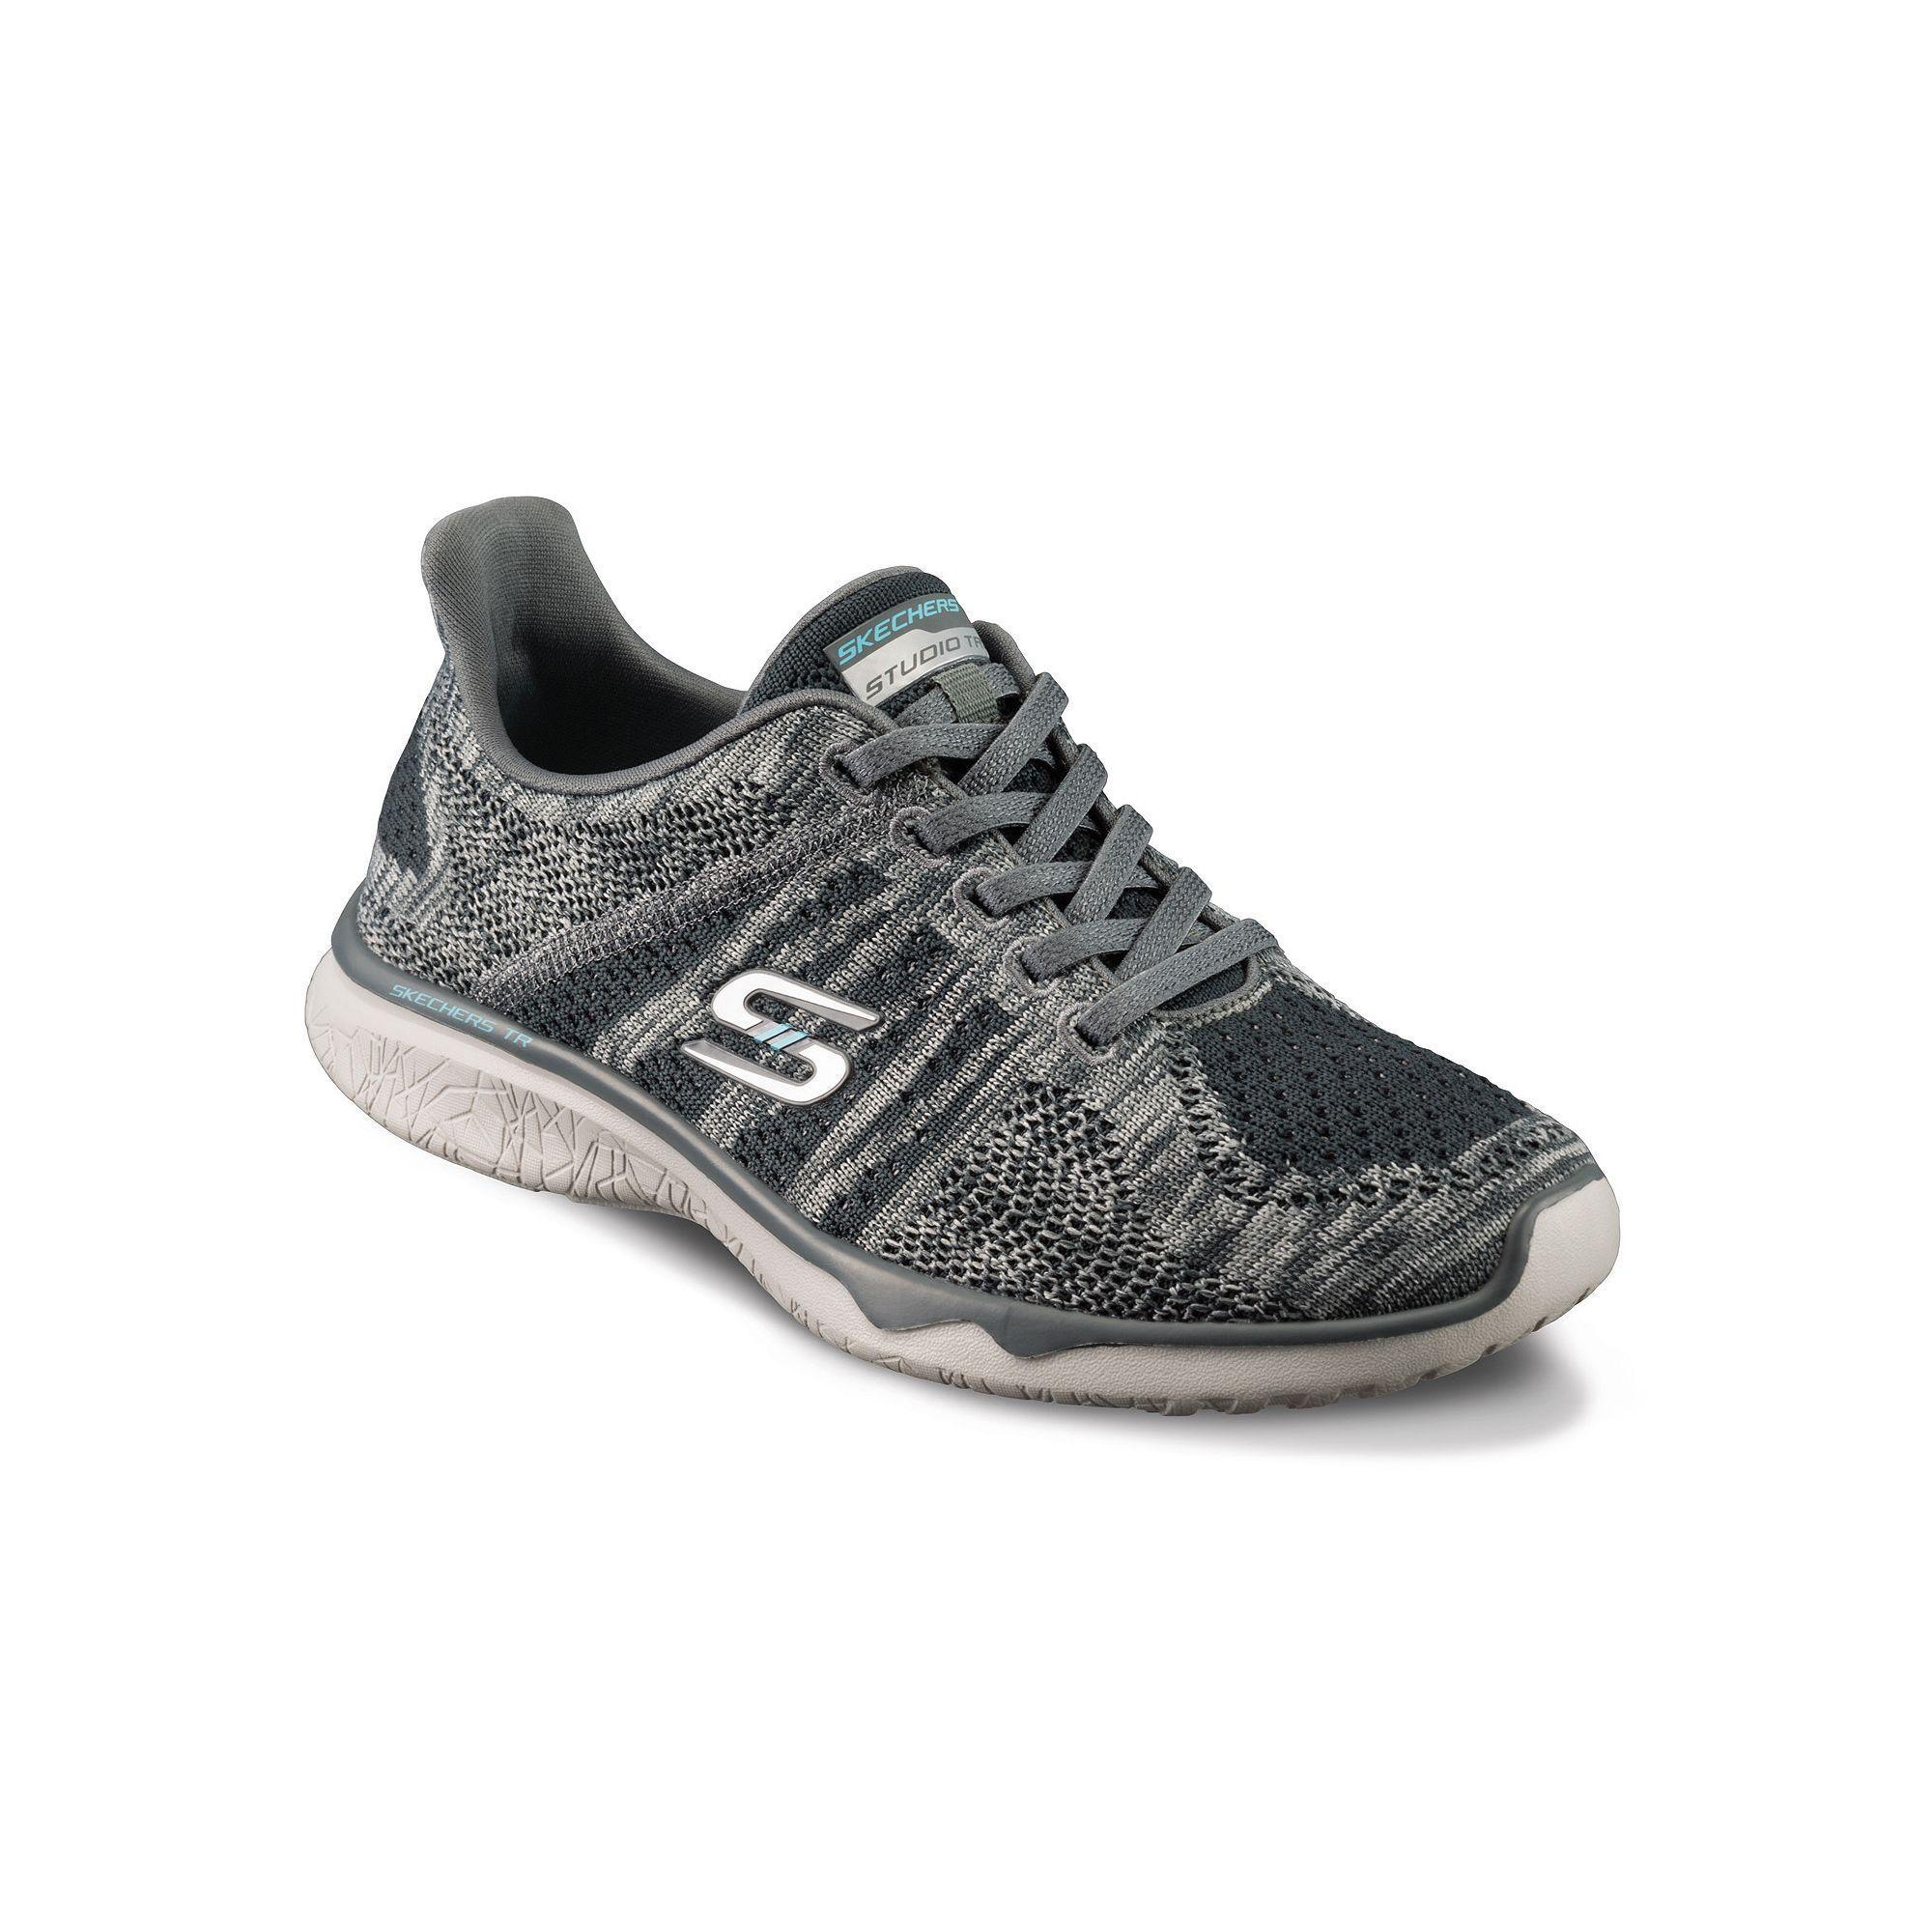 Skechers Studio Burst Edgy Women's Shoes, Size: 10, Yellow Oth